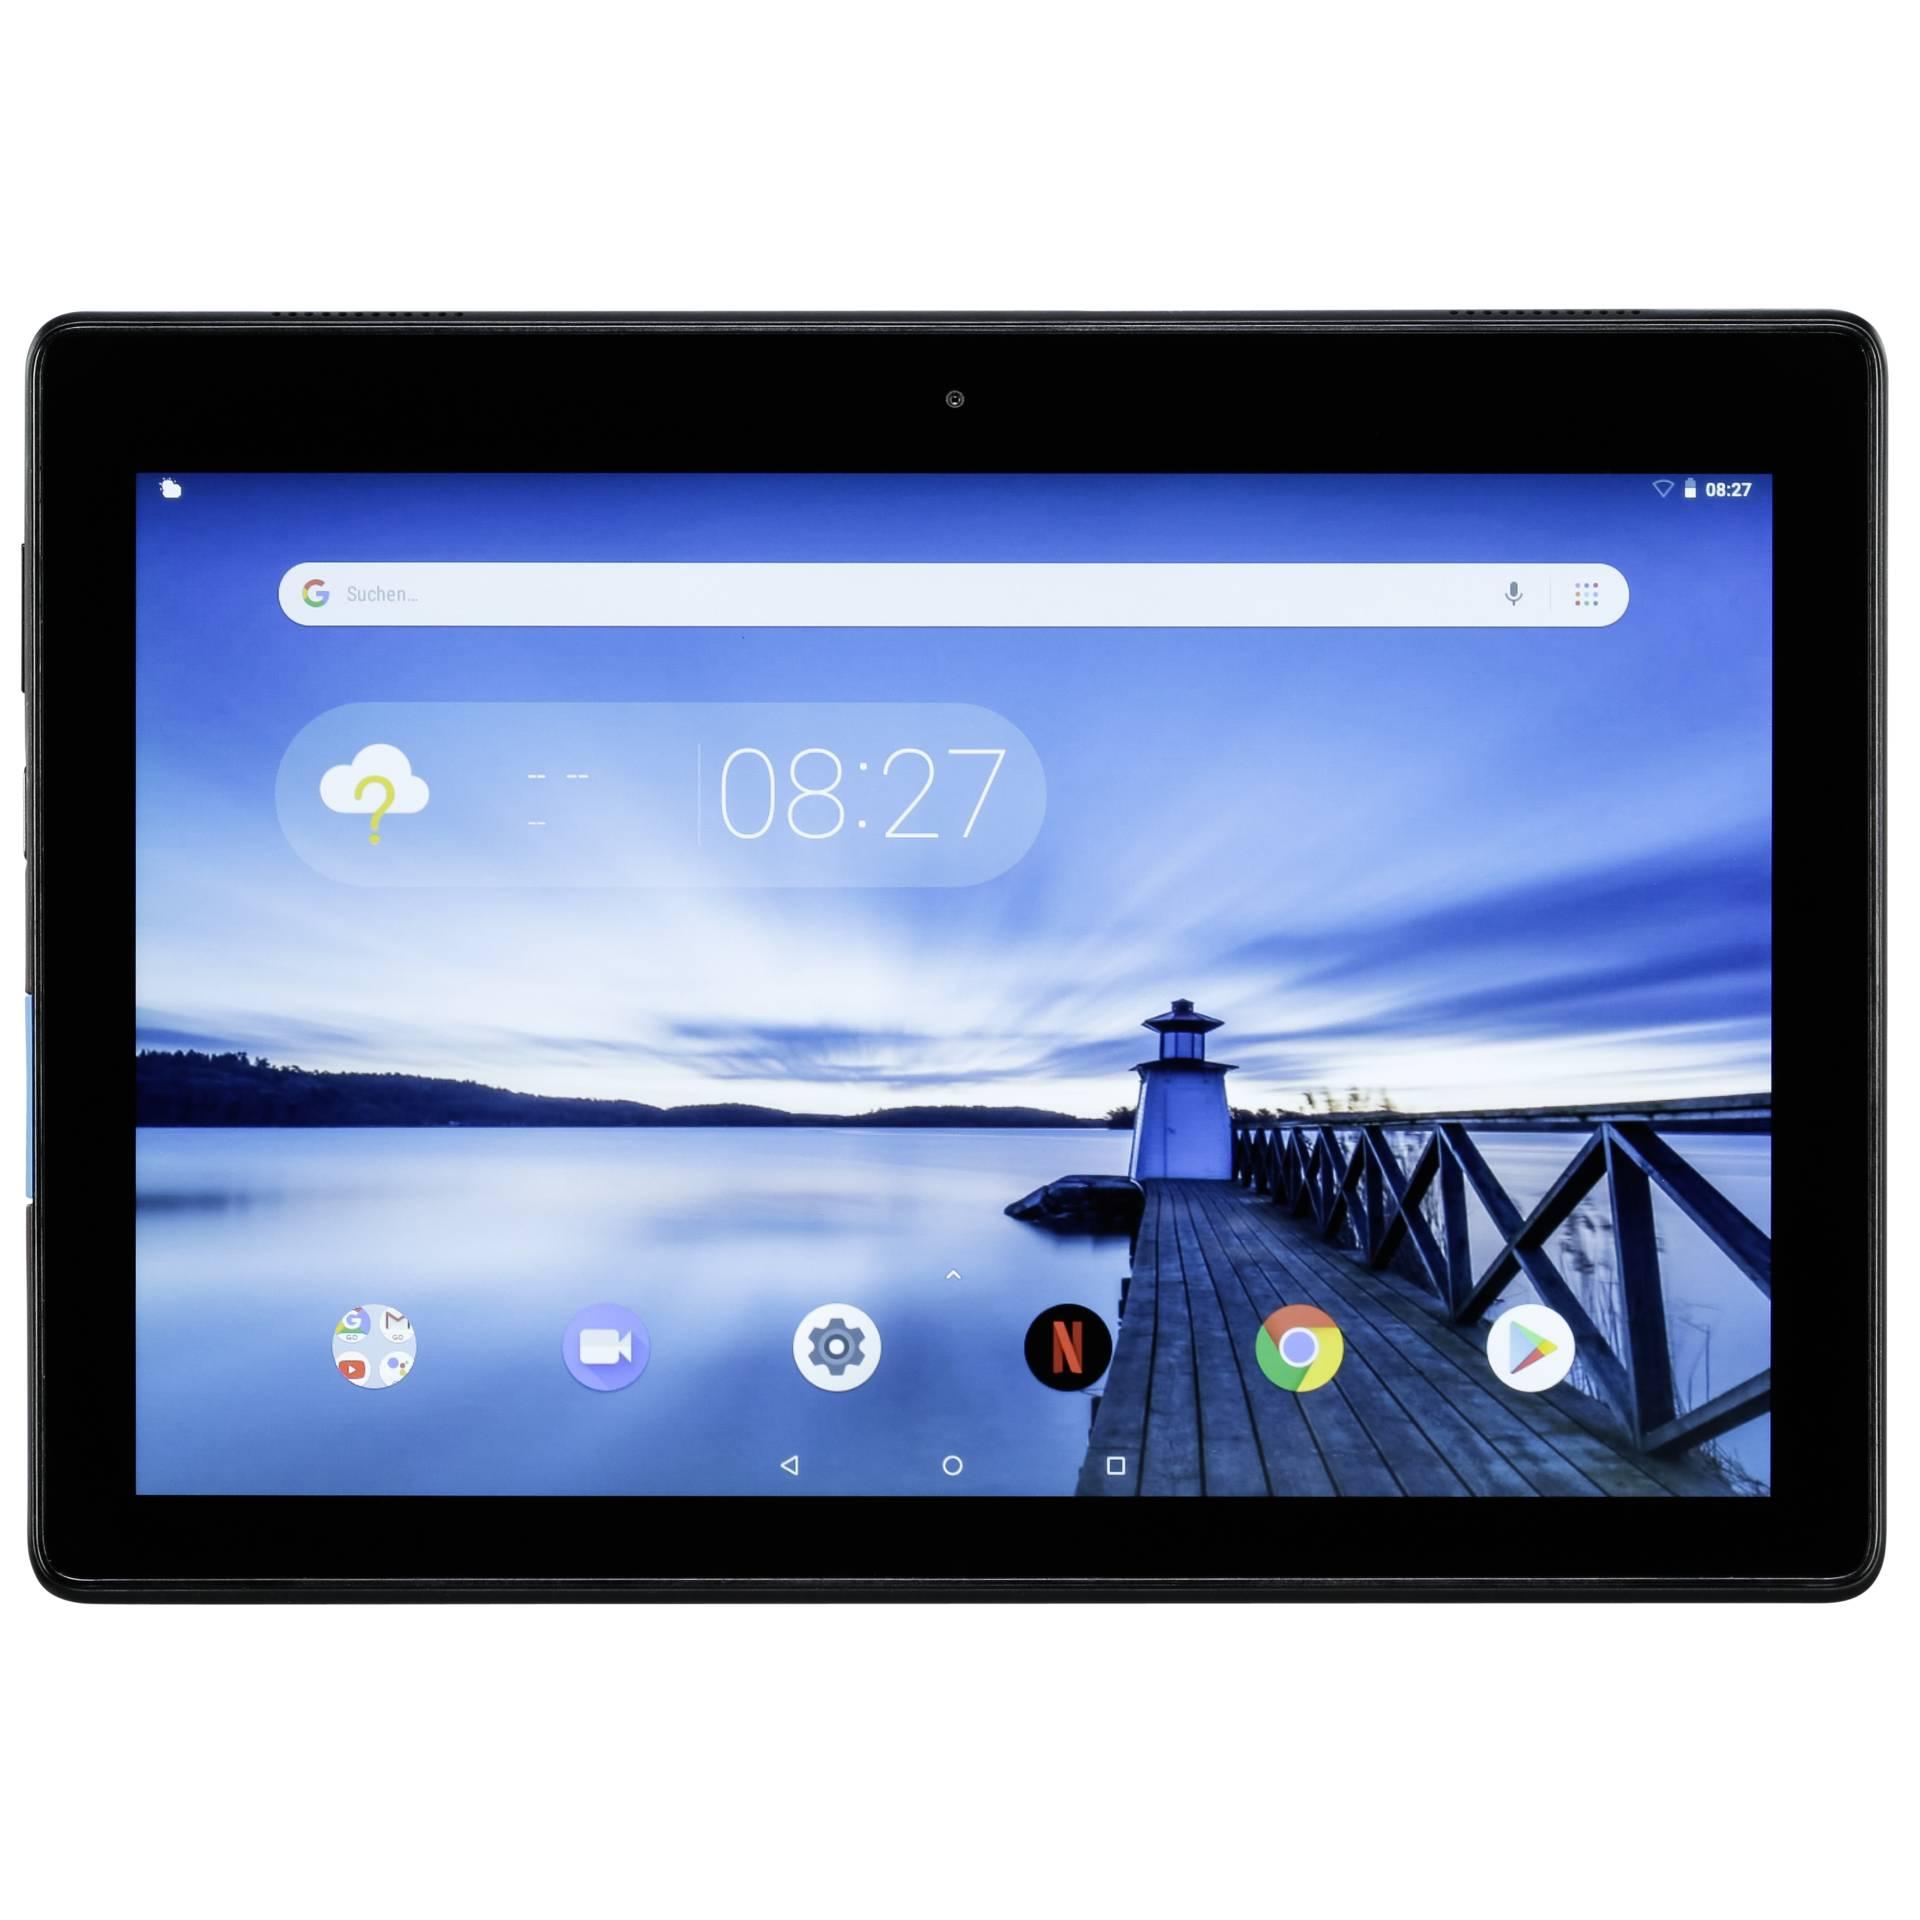 [Technikdirekt / Mastercard] Lenovo TB-X104F Tab, 10,1 Zoll HD IPS-Display, Qualcomm APQ8009, 2GB RAM, 16GB Speicher, Android 8.1